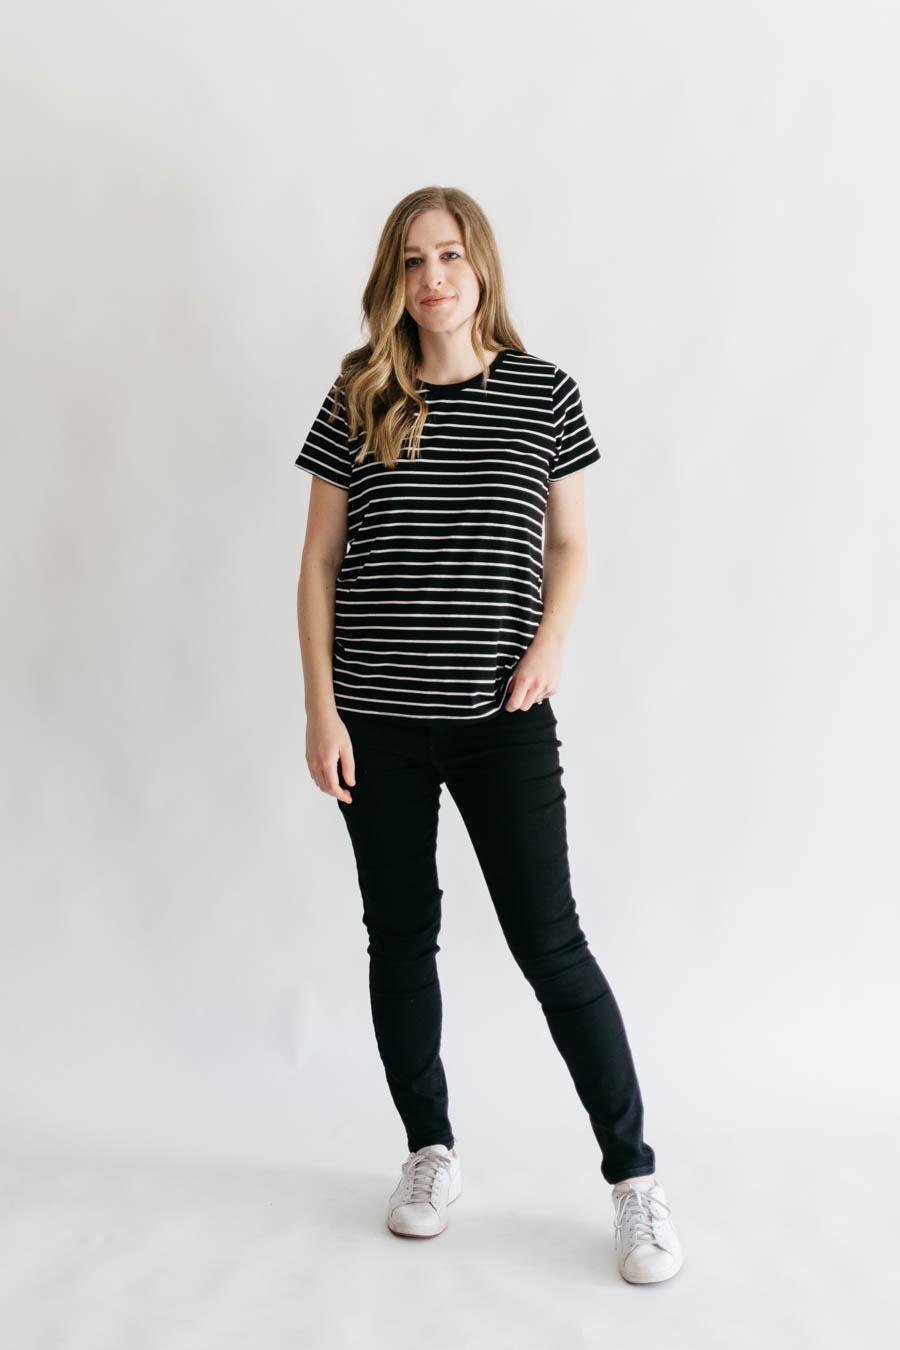 Union St Tee + D&H Fabrics